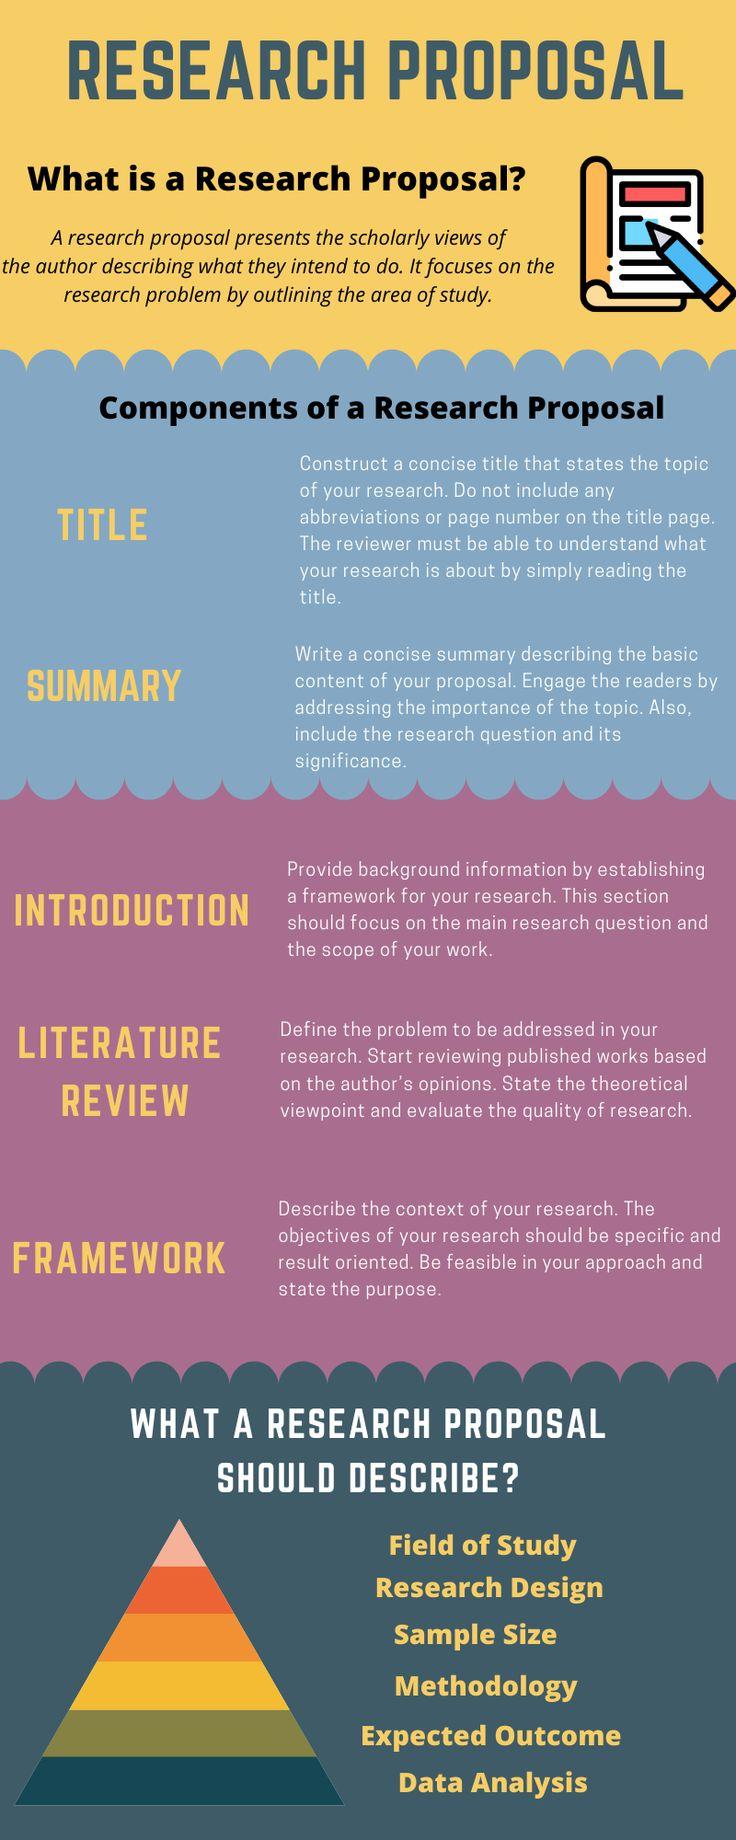 frankenstein and feminism essays